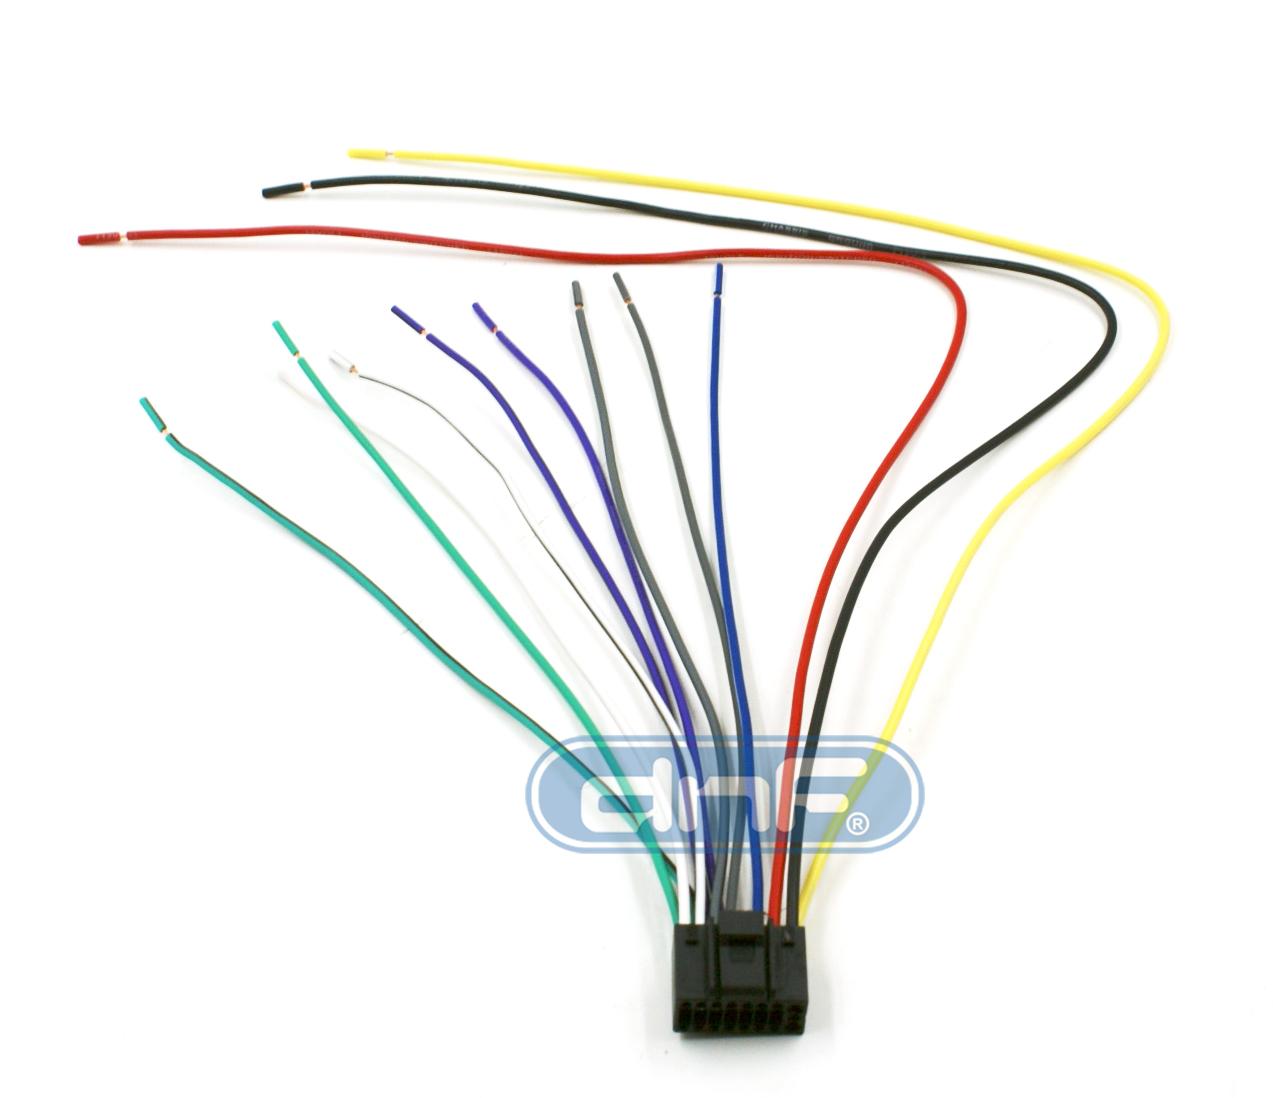 Kenwood Wiring Harness 16 PIN KDC138 KDC215S KDC217  SHIPS FREE TODAY! | eBay